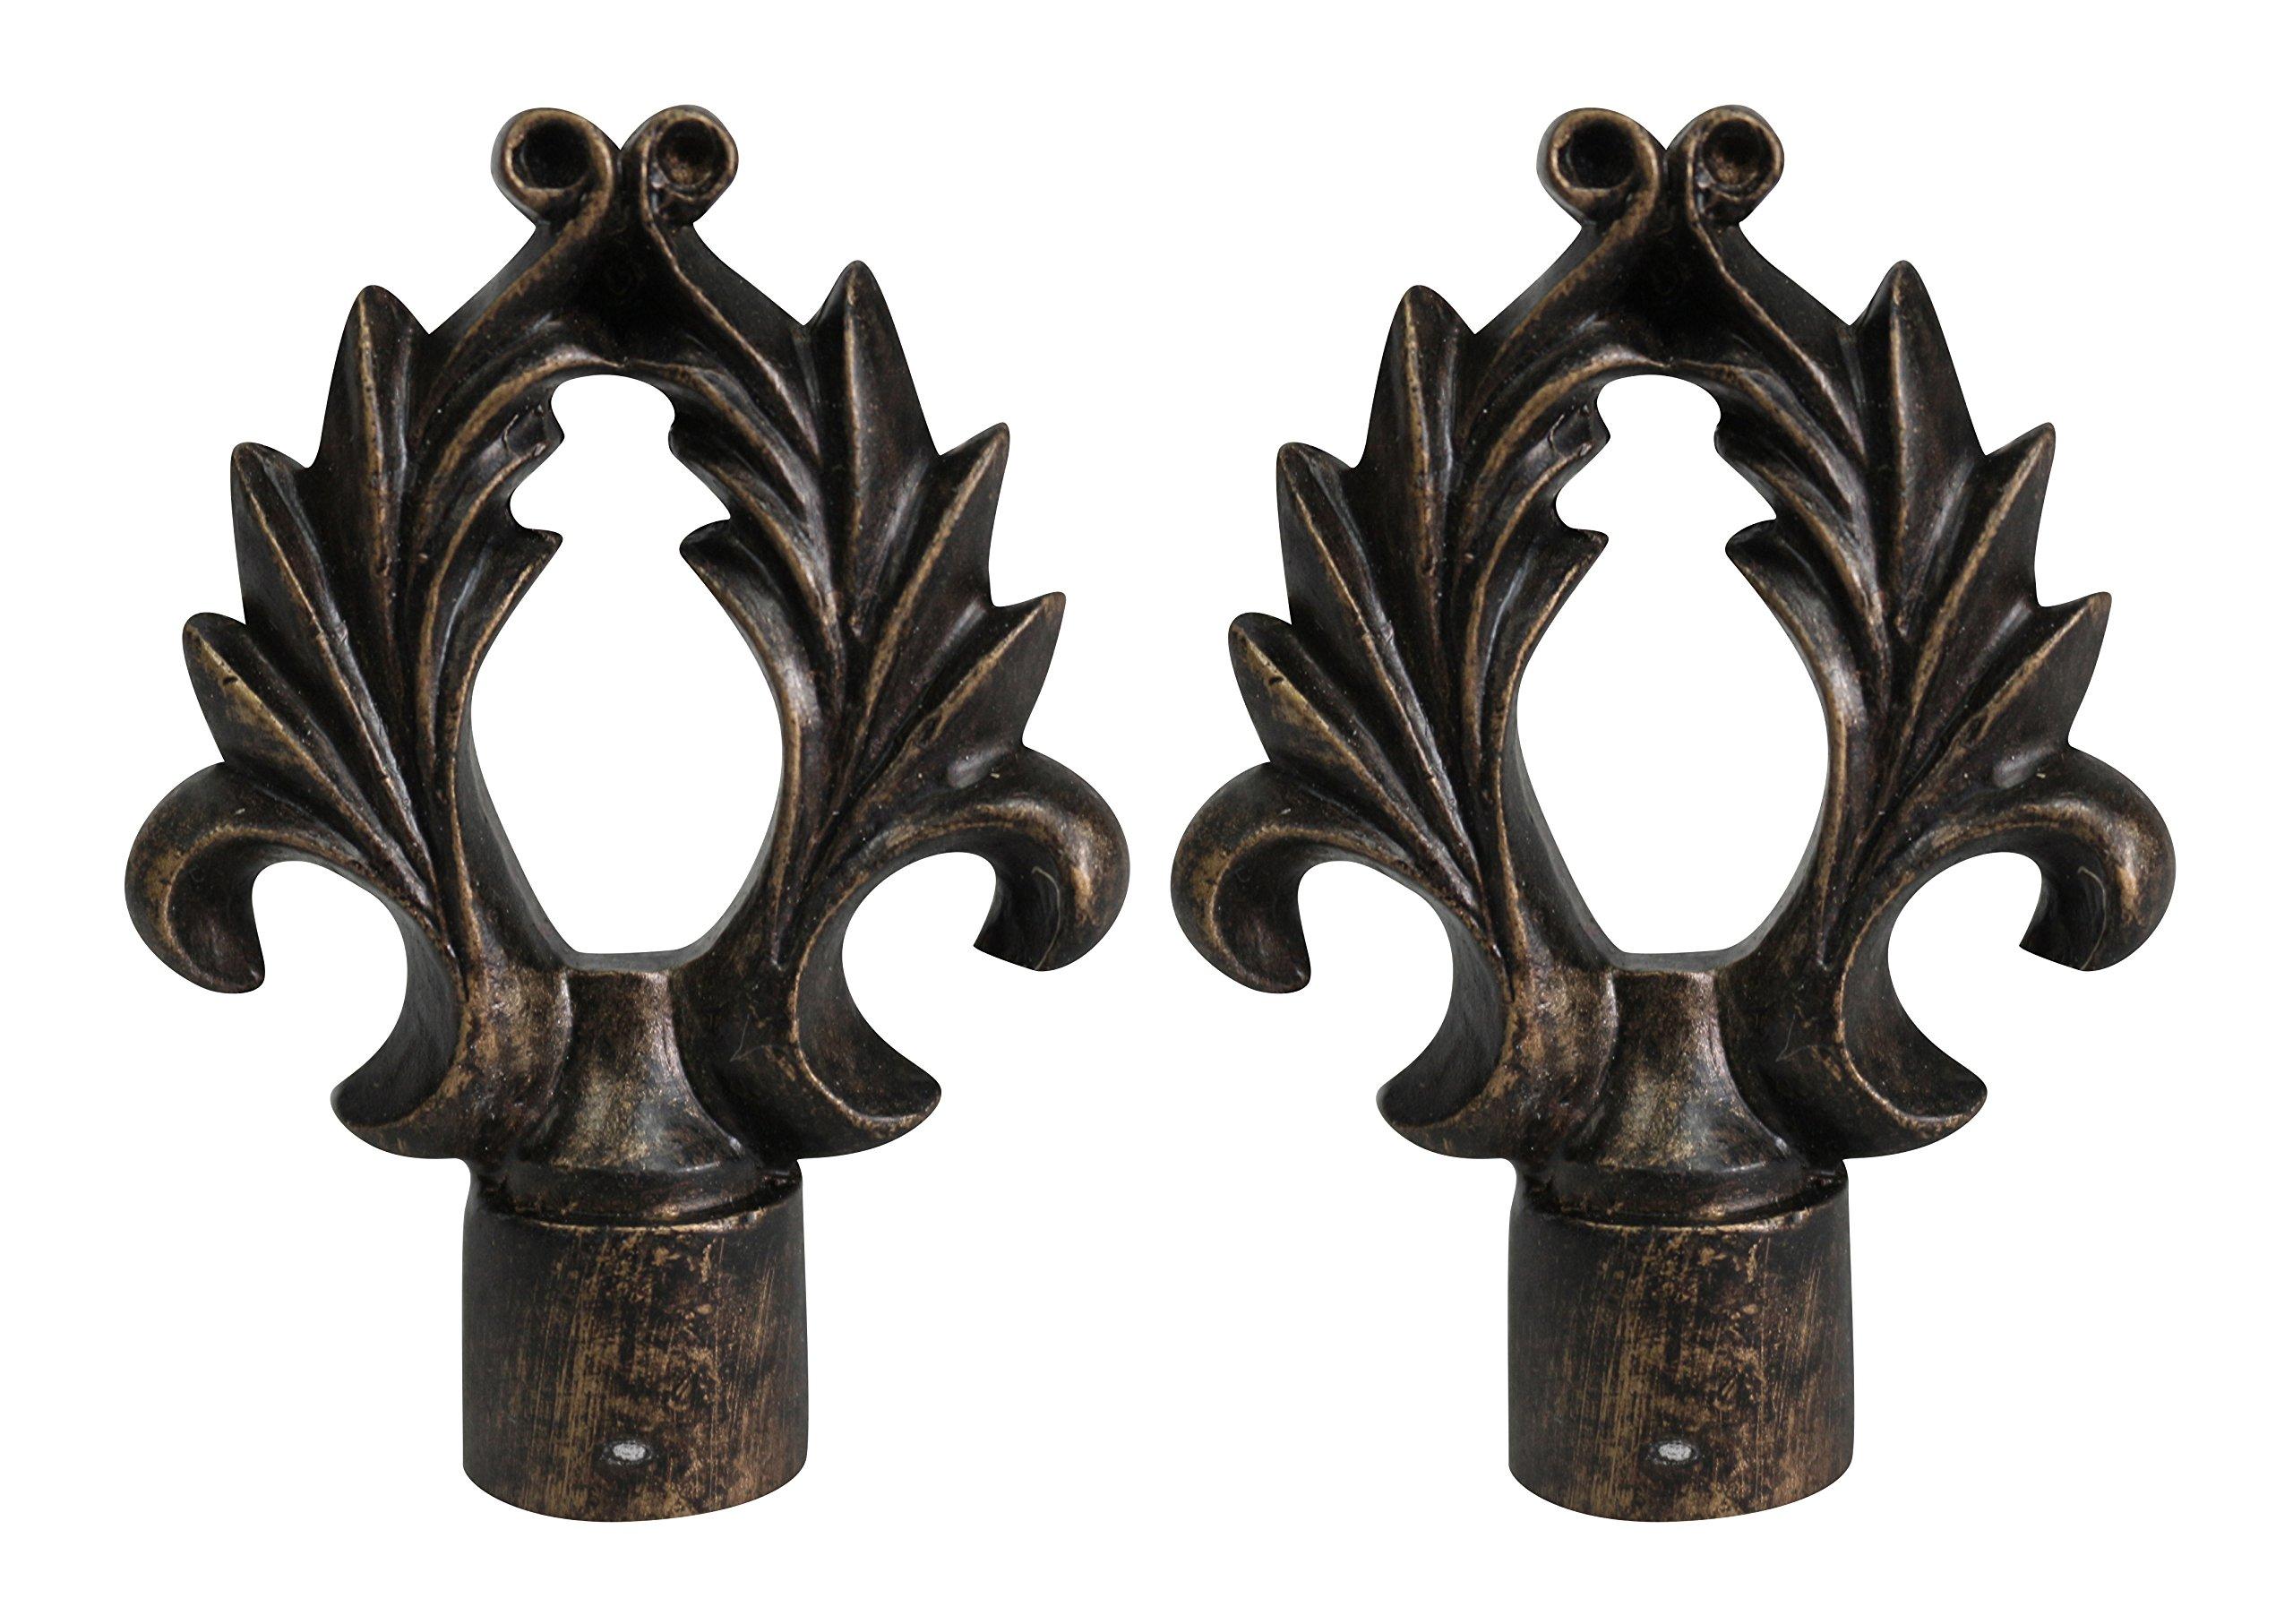 Urbanest Set of 2 Calvinia Lamp Finials, 2 5/8-inch Tall, Antique Bronze